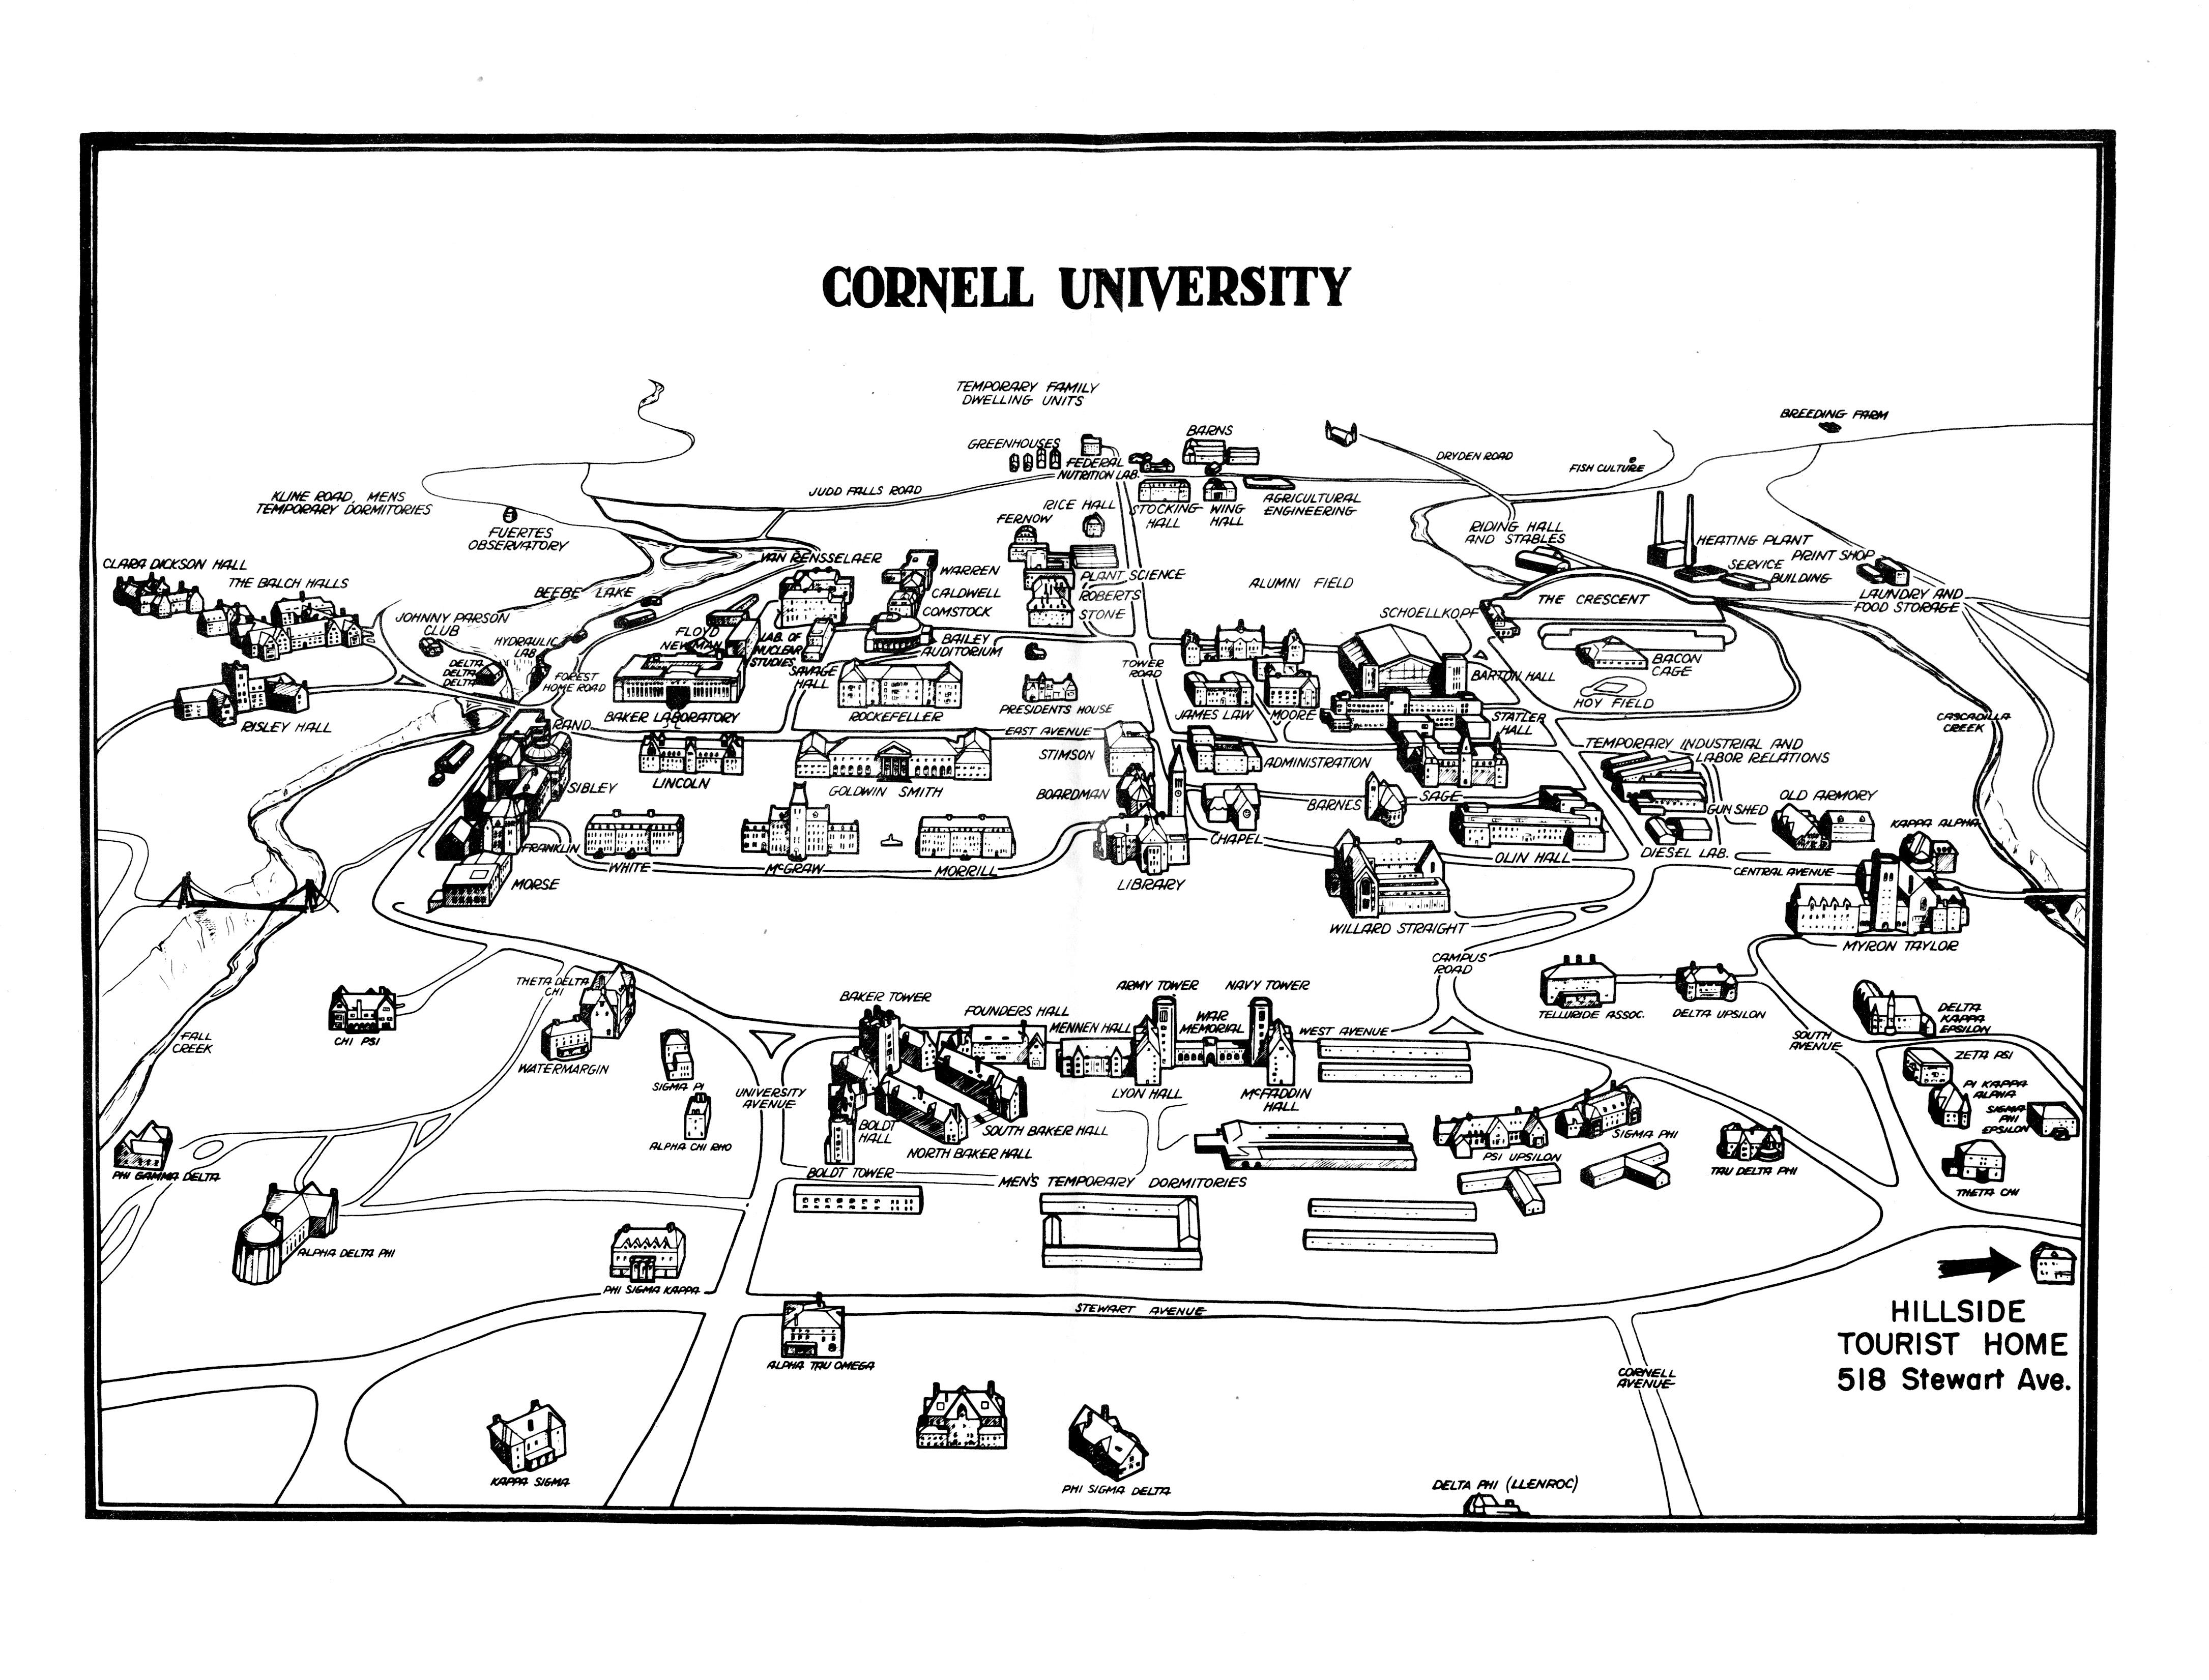 File:Cornell University campus map 1952.jpg - Wikimedia Commons